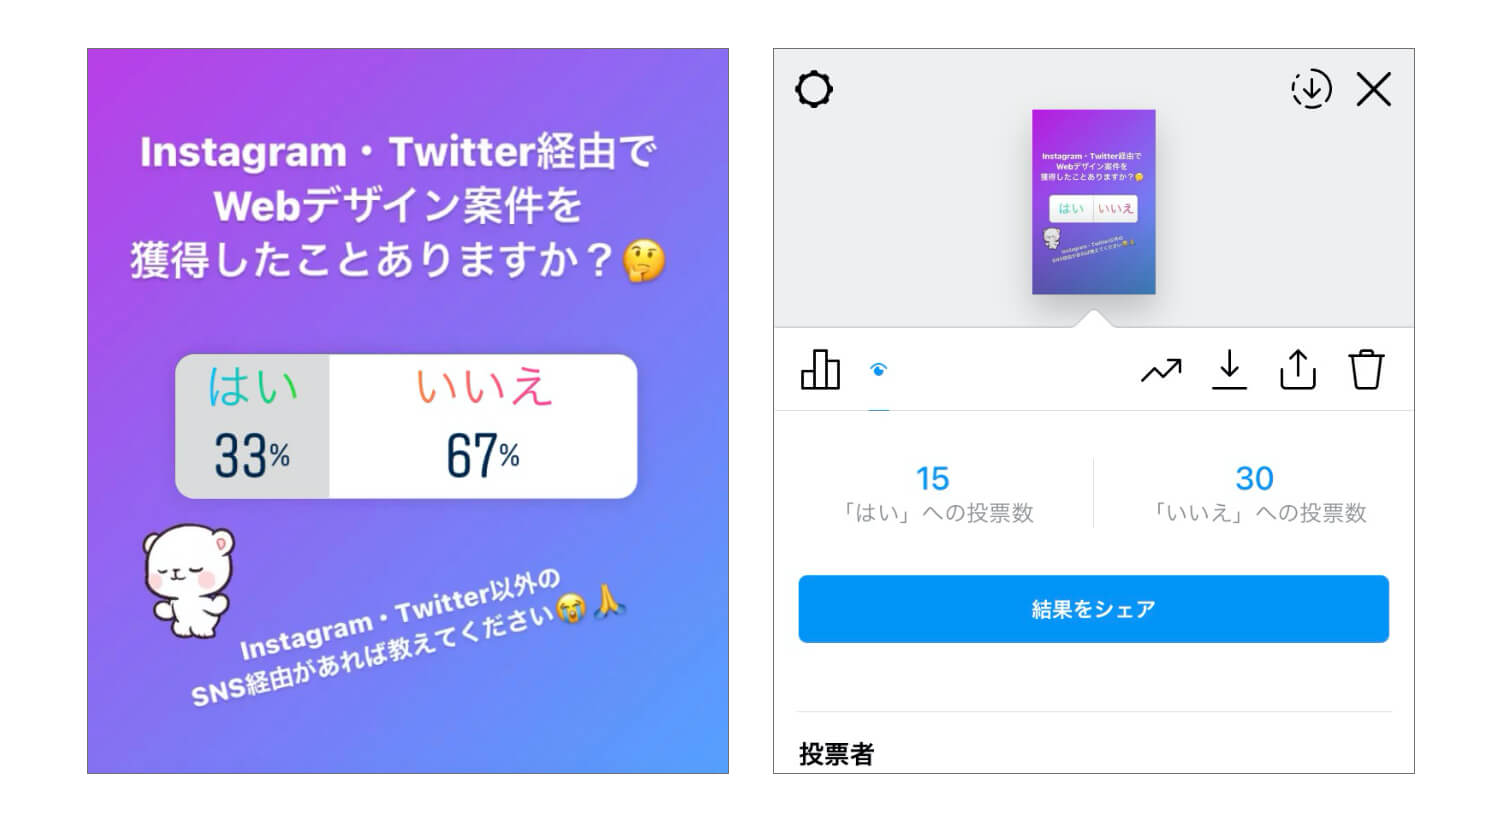 Twitter・Instagram経由で案件を獲得したwebデザイナーの割合は45名中33%